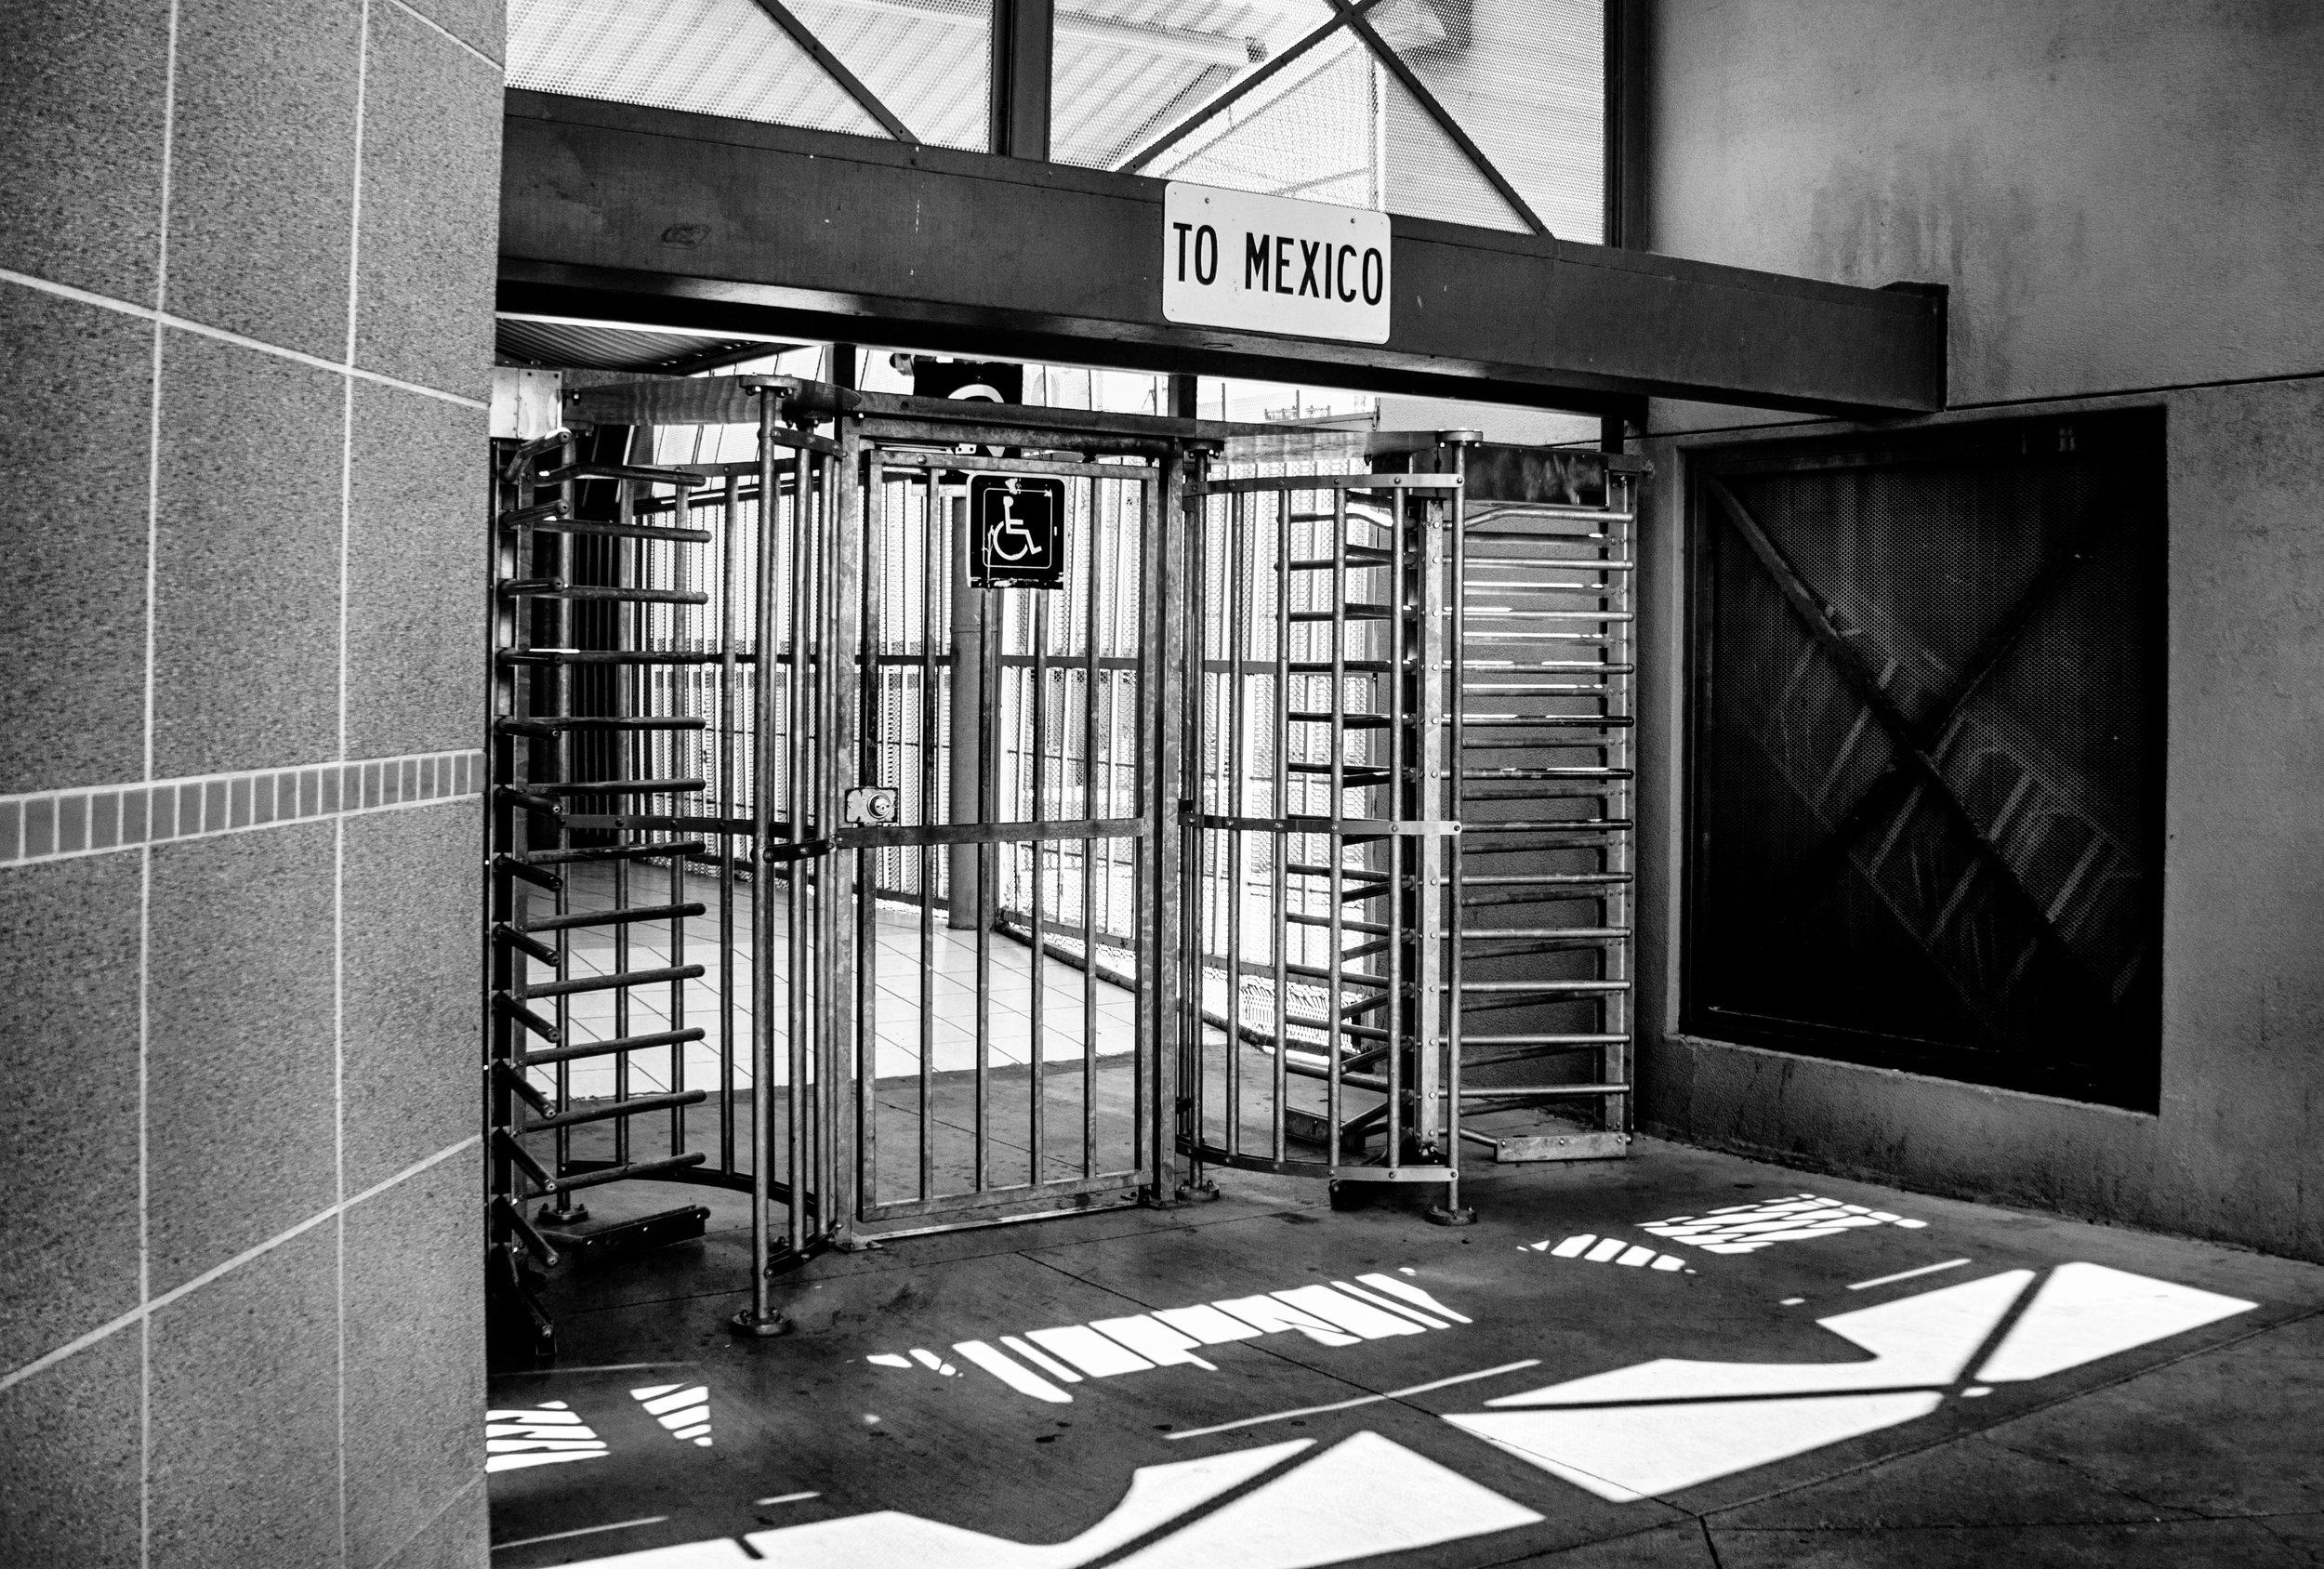 vickygood_photography_travel_mexan_border.jpg